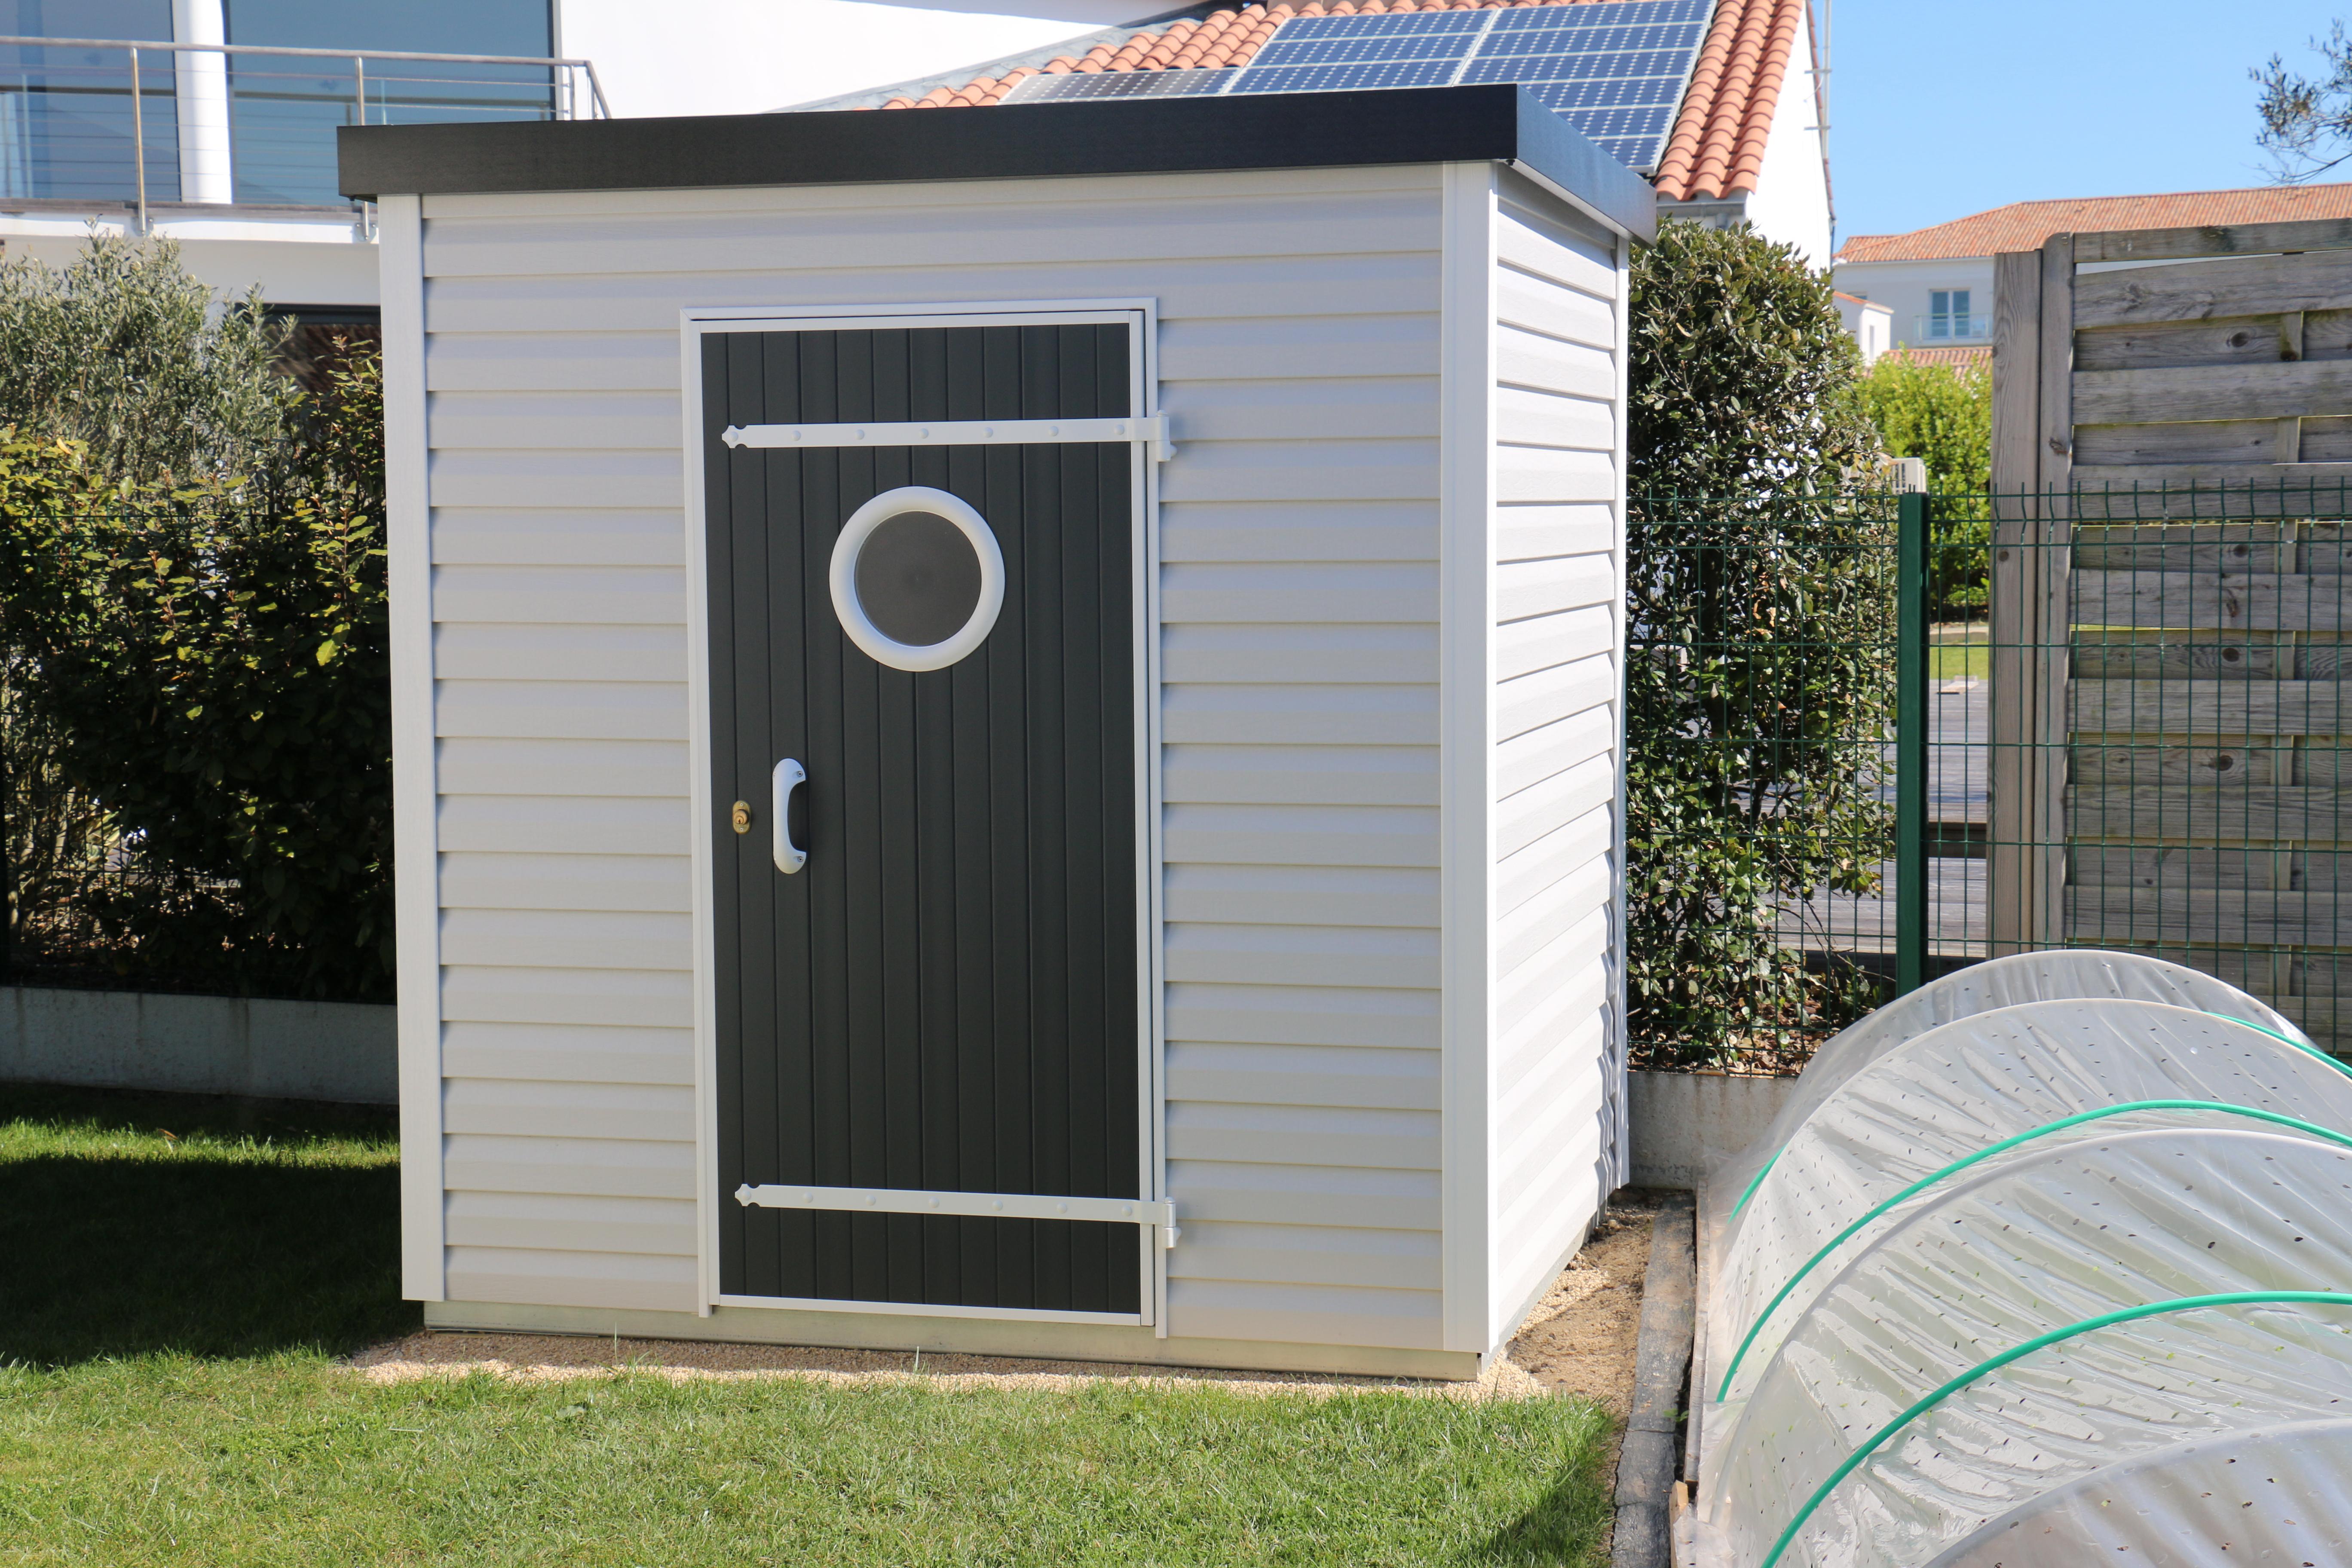 Abri De Jardin Design Toit Plat 3,72 M² - Abri Pvc < 10 M² Nea Concept avec Abri Jardin Design